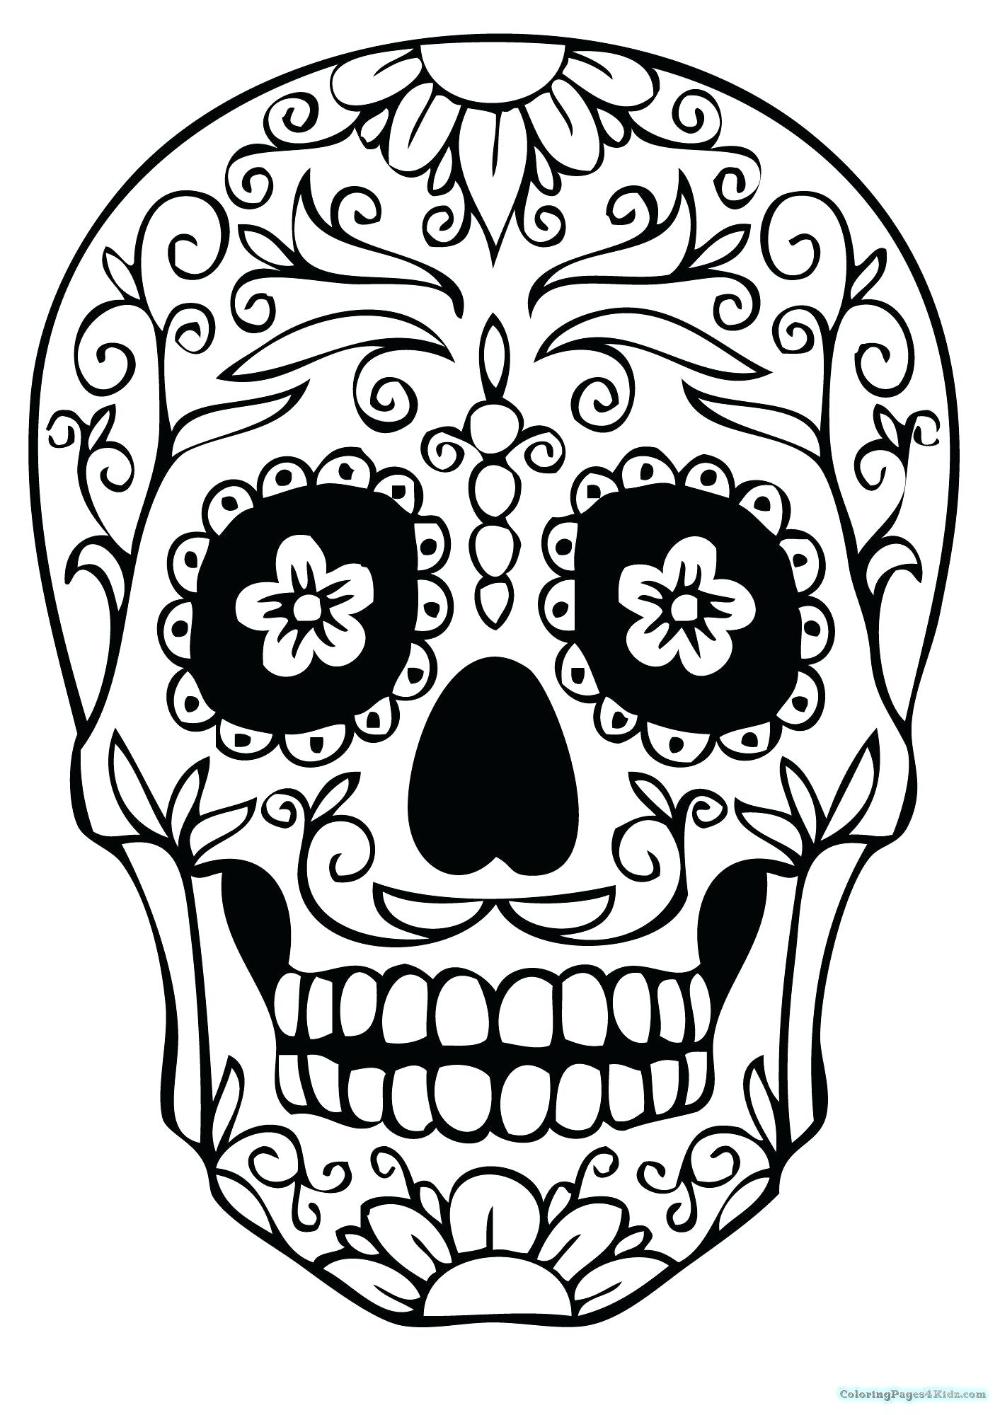 Skull Mandala Coloring Pages, HD Png Download - kindpng | 1415x1000